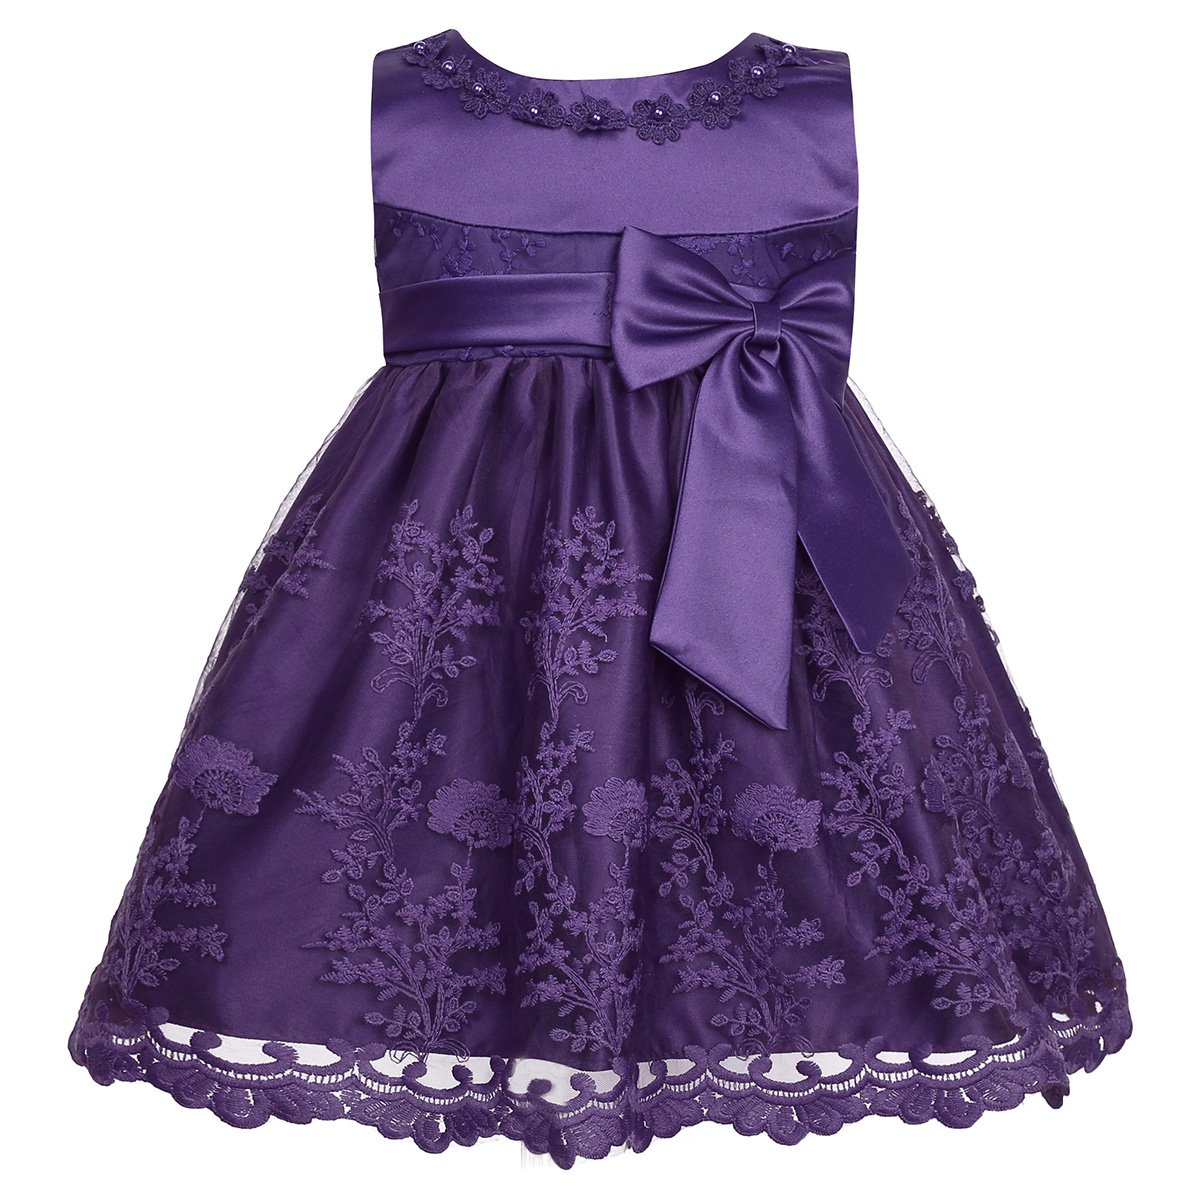 MSemis Baby Girls' Embroidered Christening Baptism Dress Infant Flower Girls Wedding Dresses Purple 18-24 Months